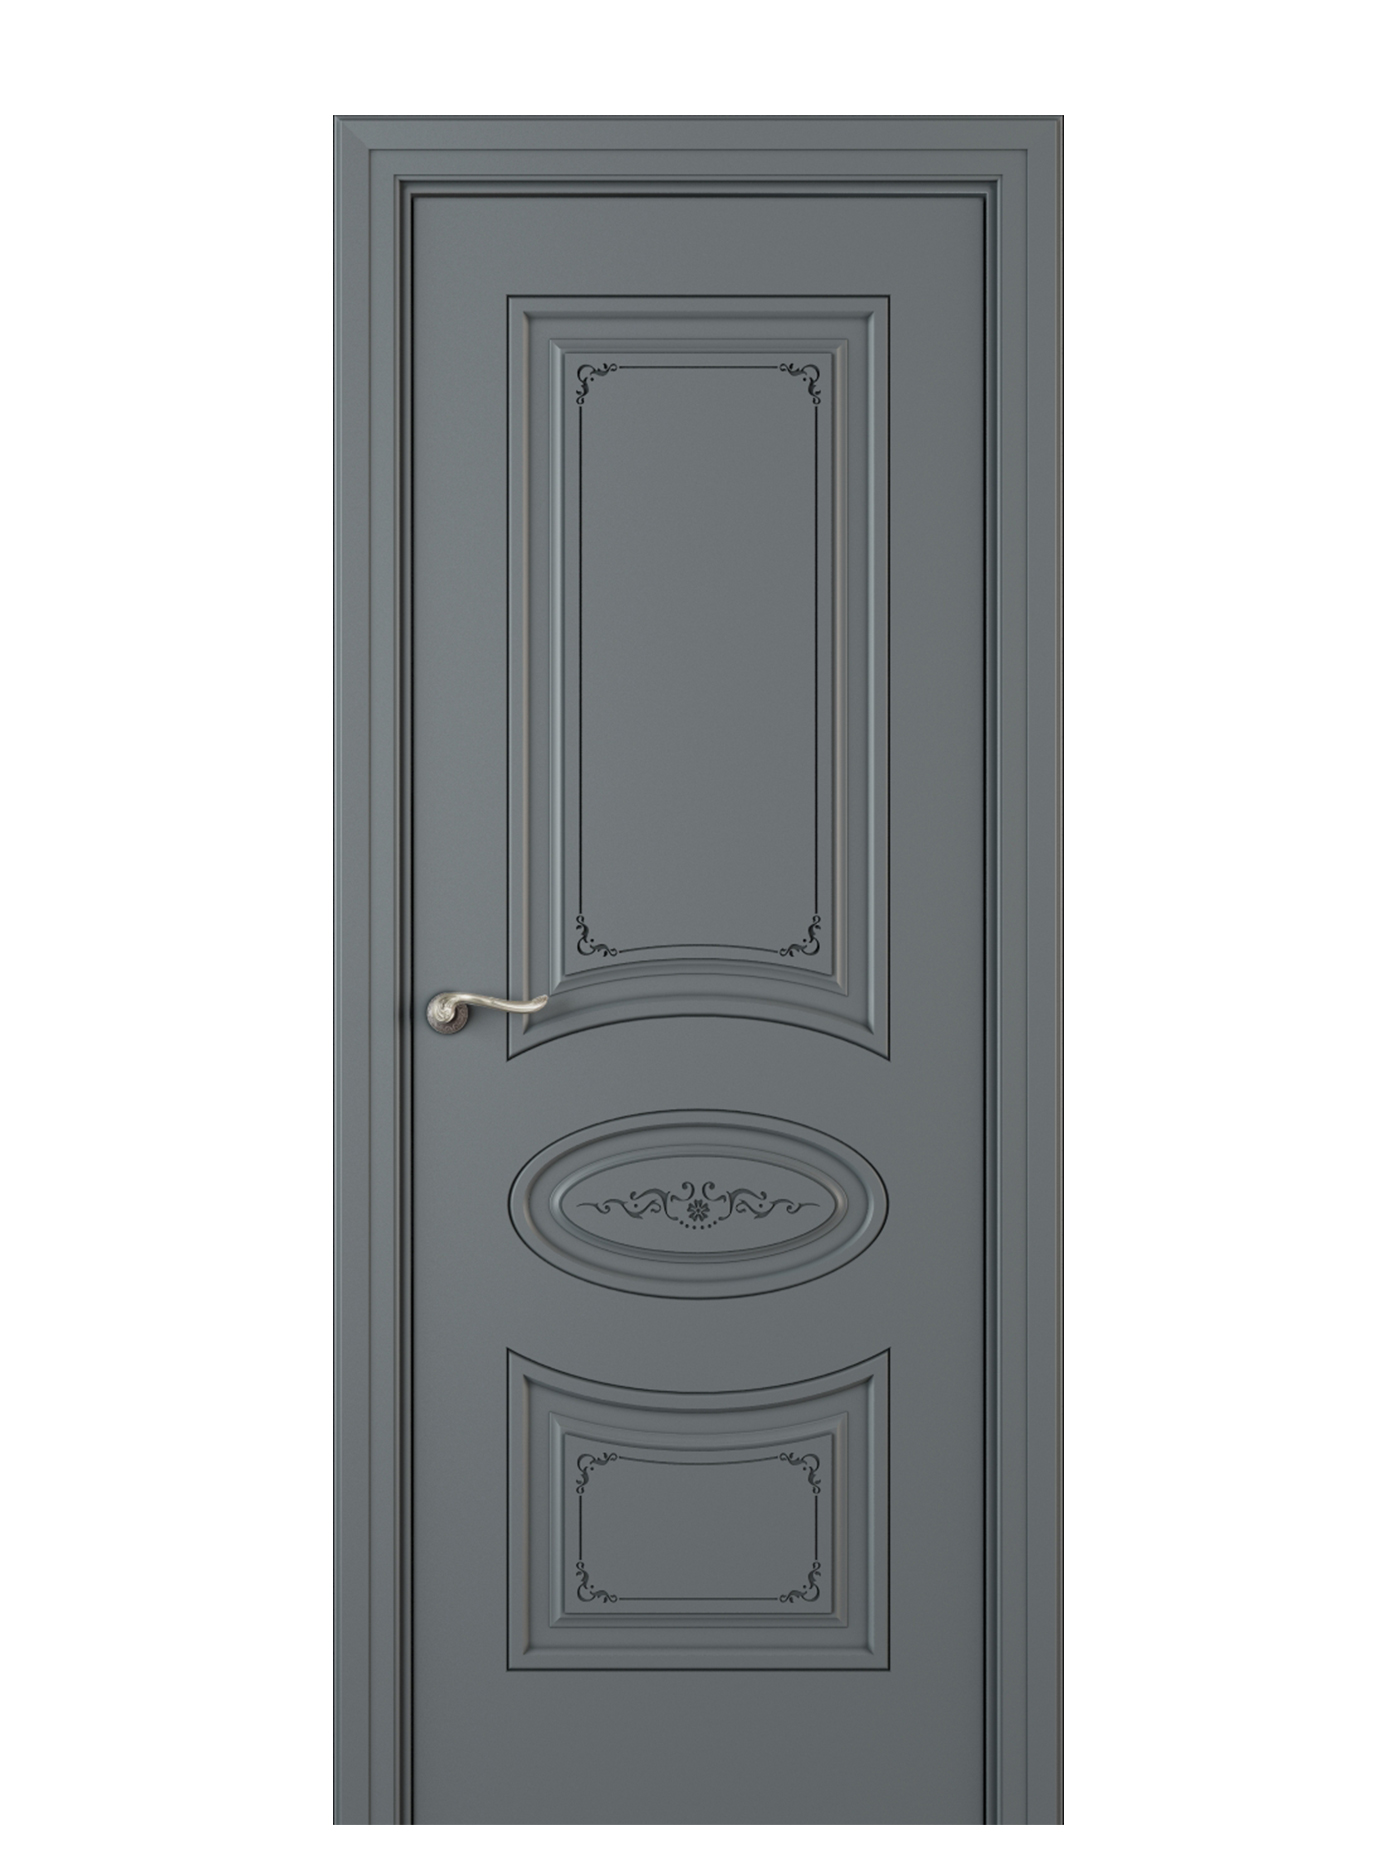 Image Amelia Interior Door Italian Enamel 7011 0